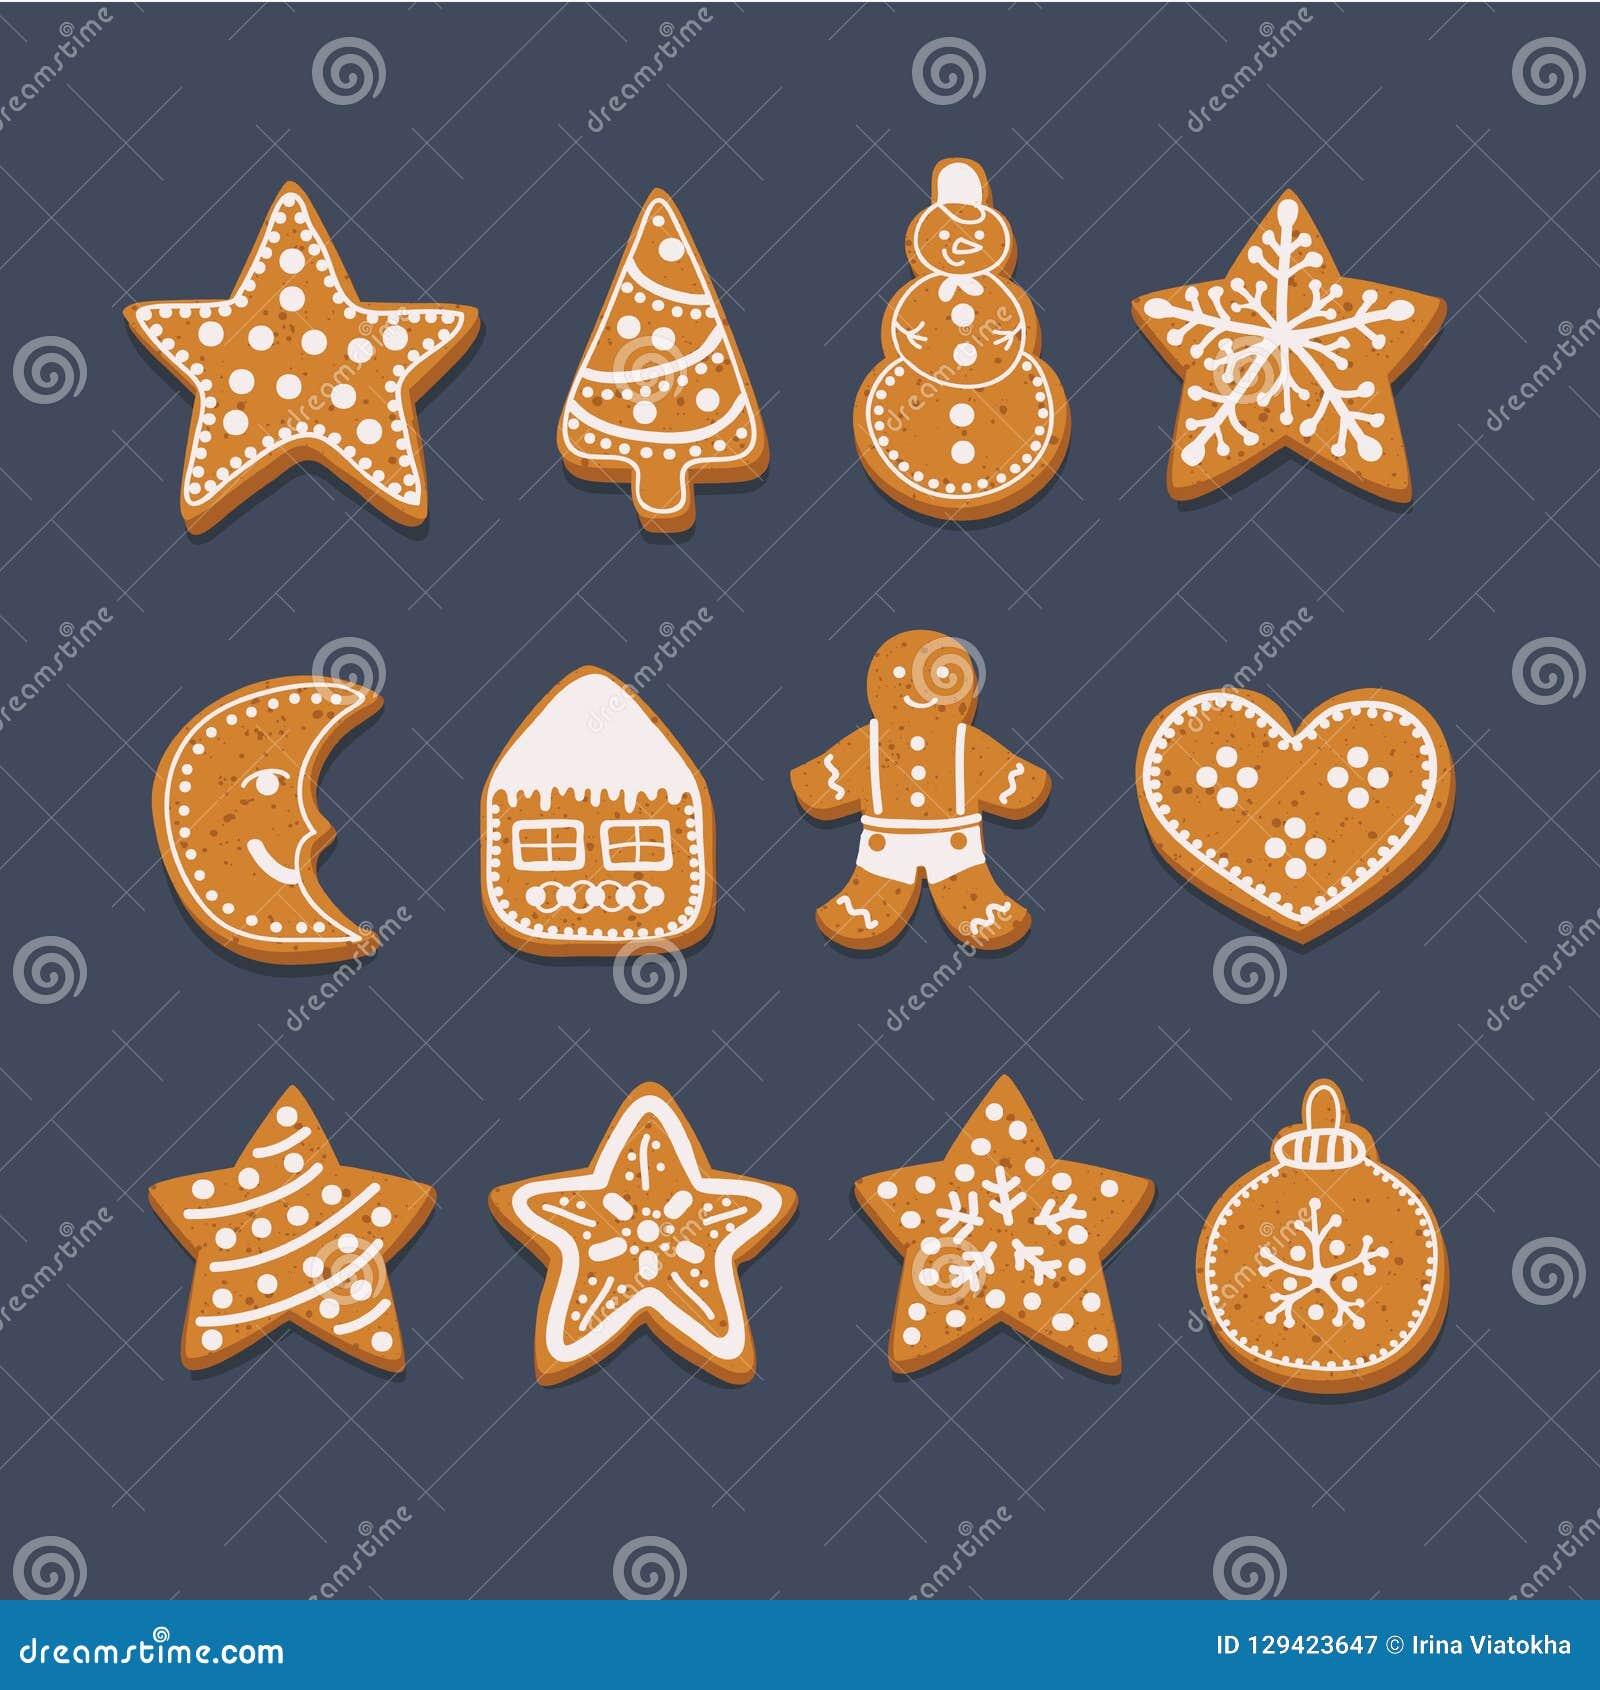 Christmas Gingerbread House Cartoon.Set Christmas Gingerbread Stock Vector Illustration Of